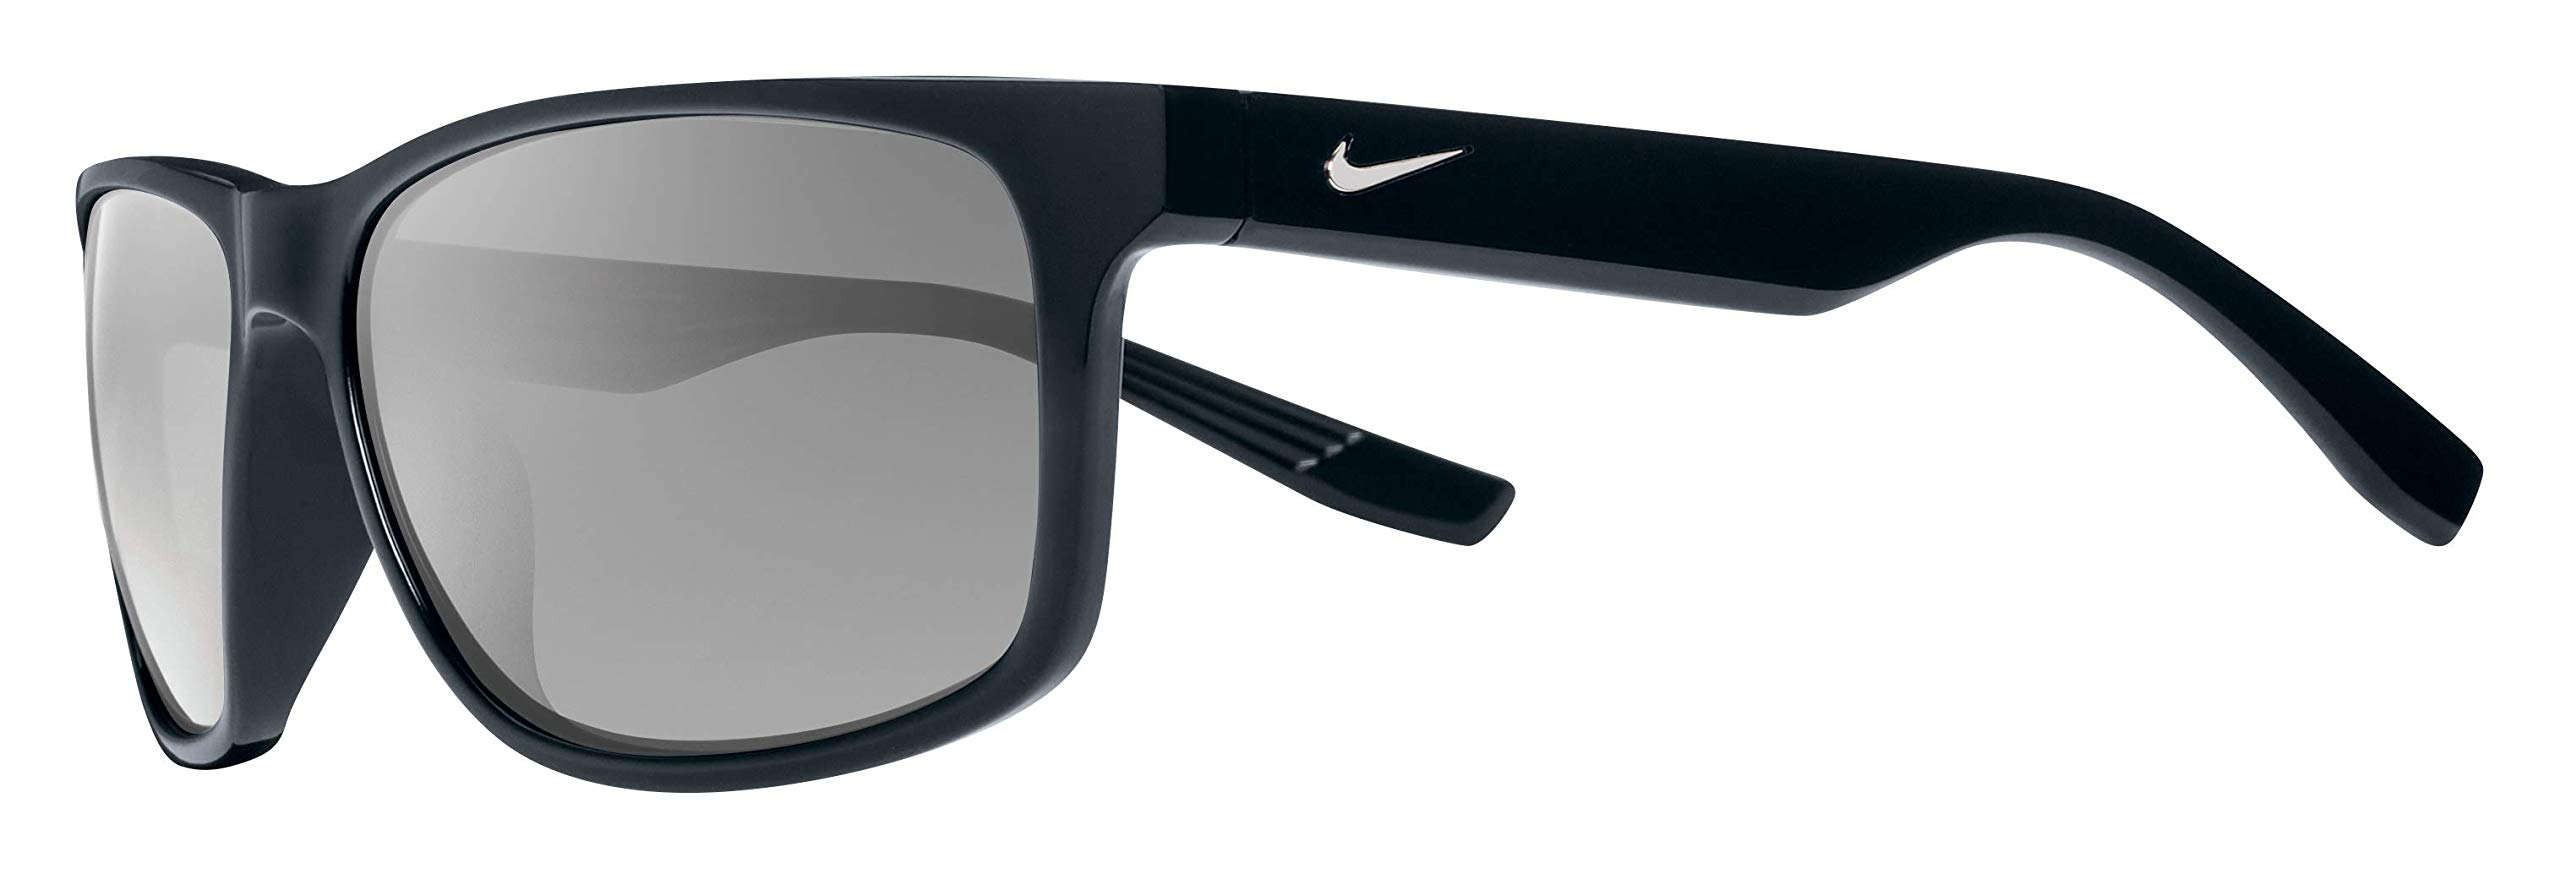 Nike Cruiser Square Sunglasses, Black, One Size